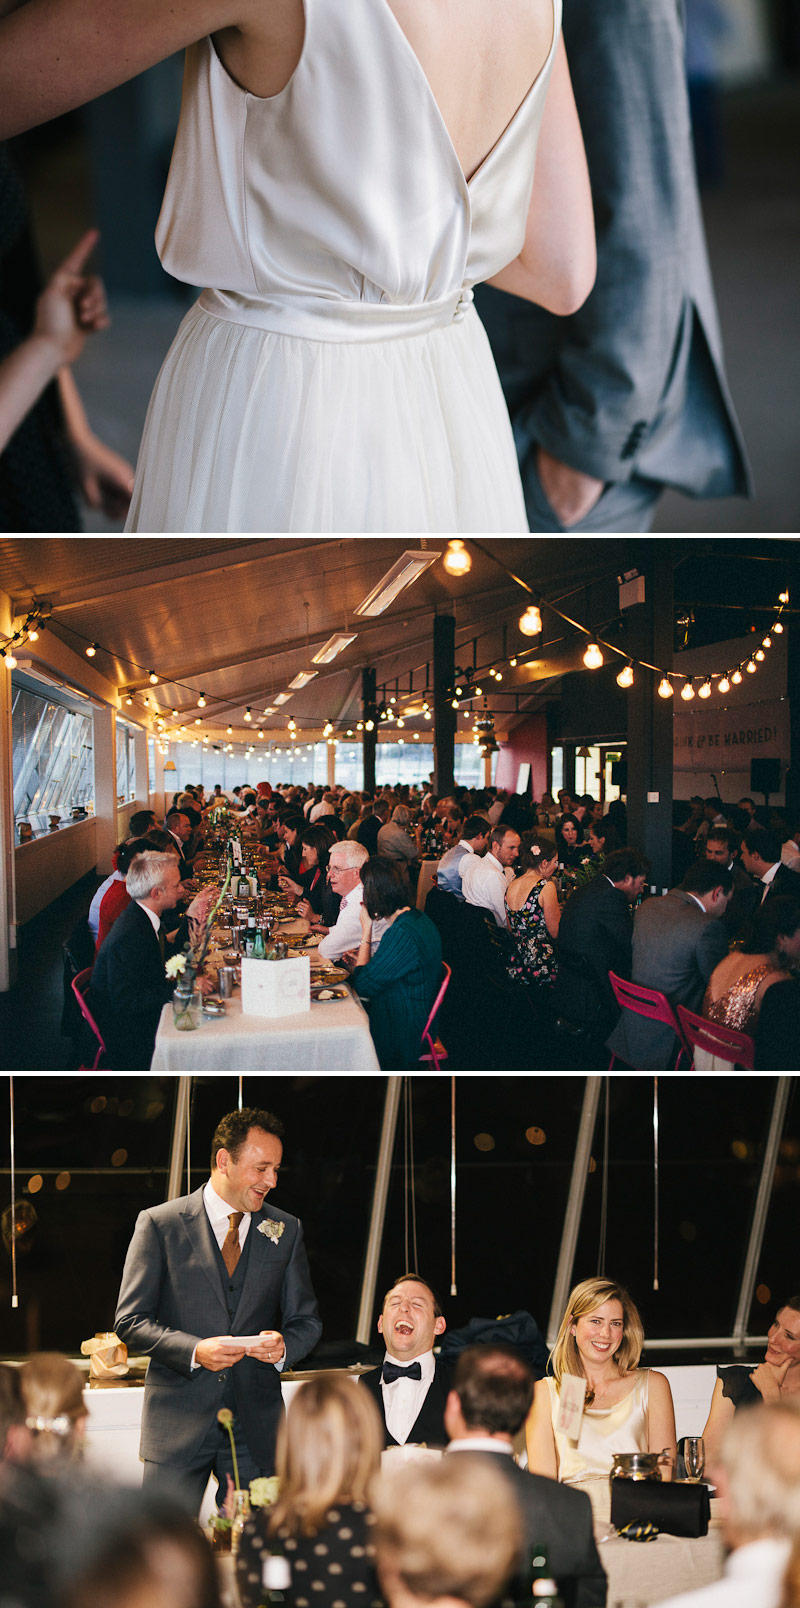 Watters Irina Wedding Dress